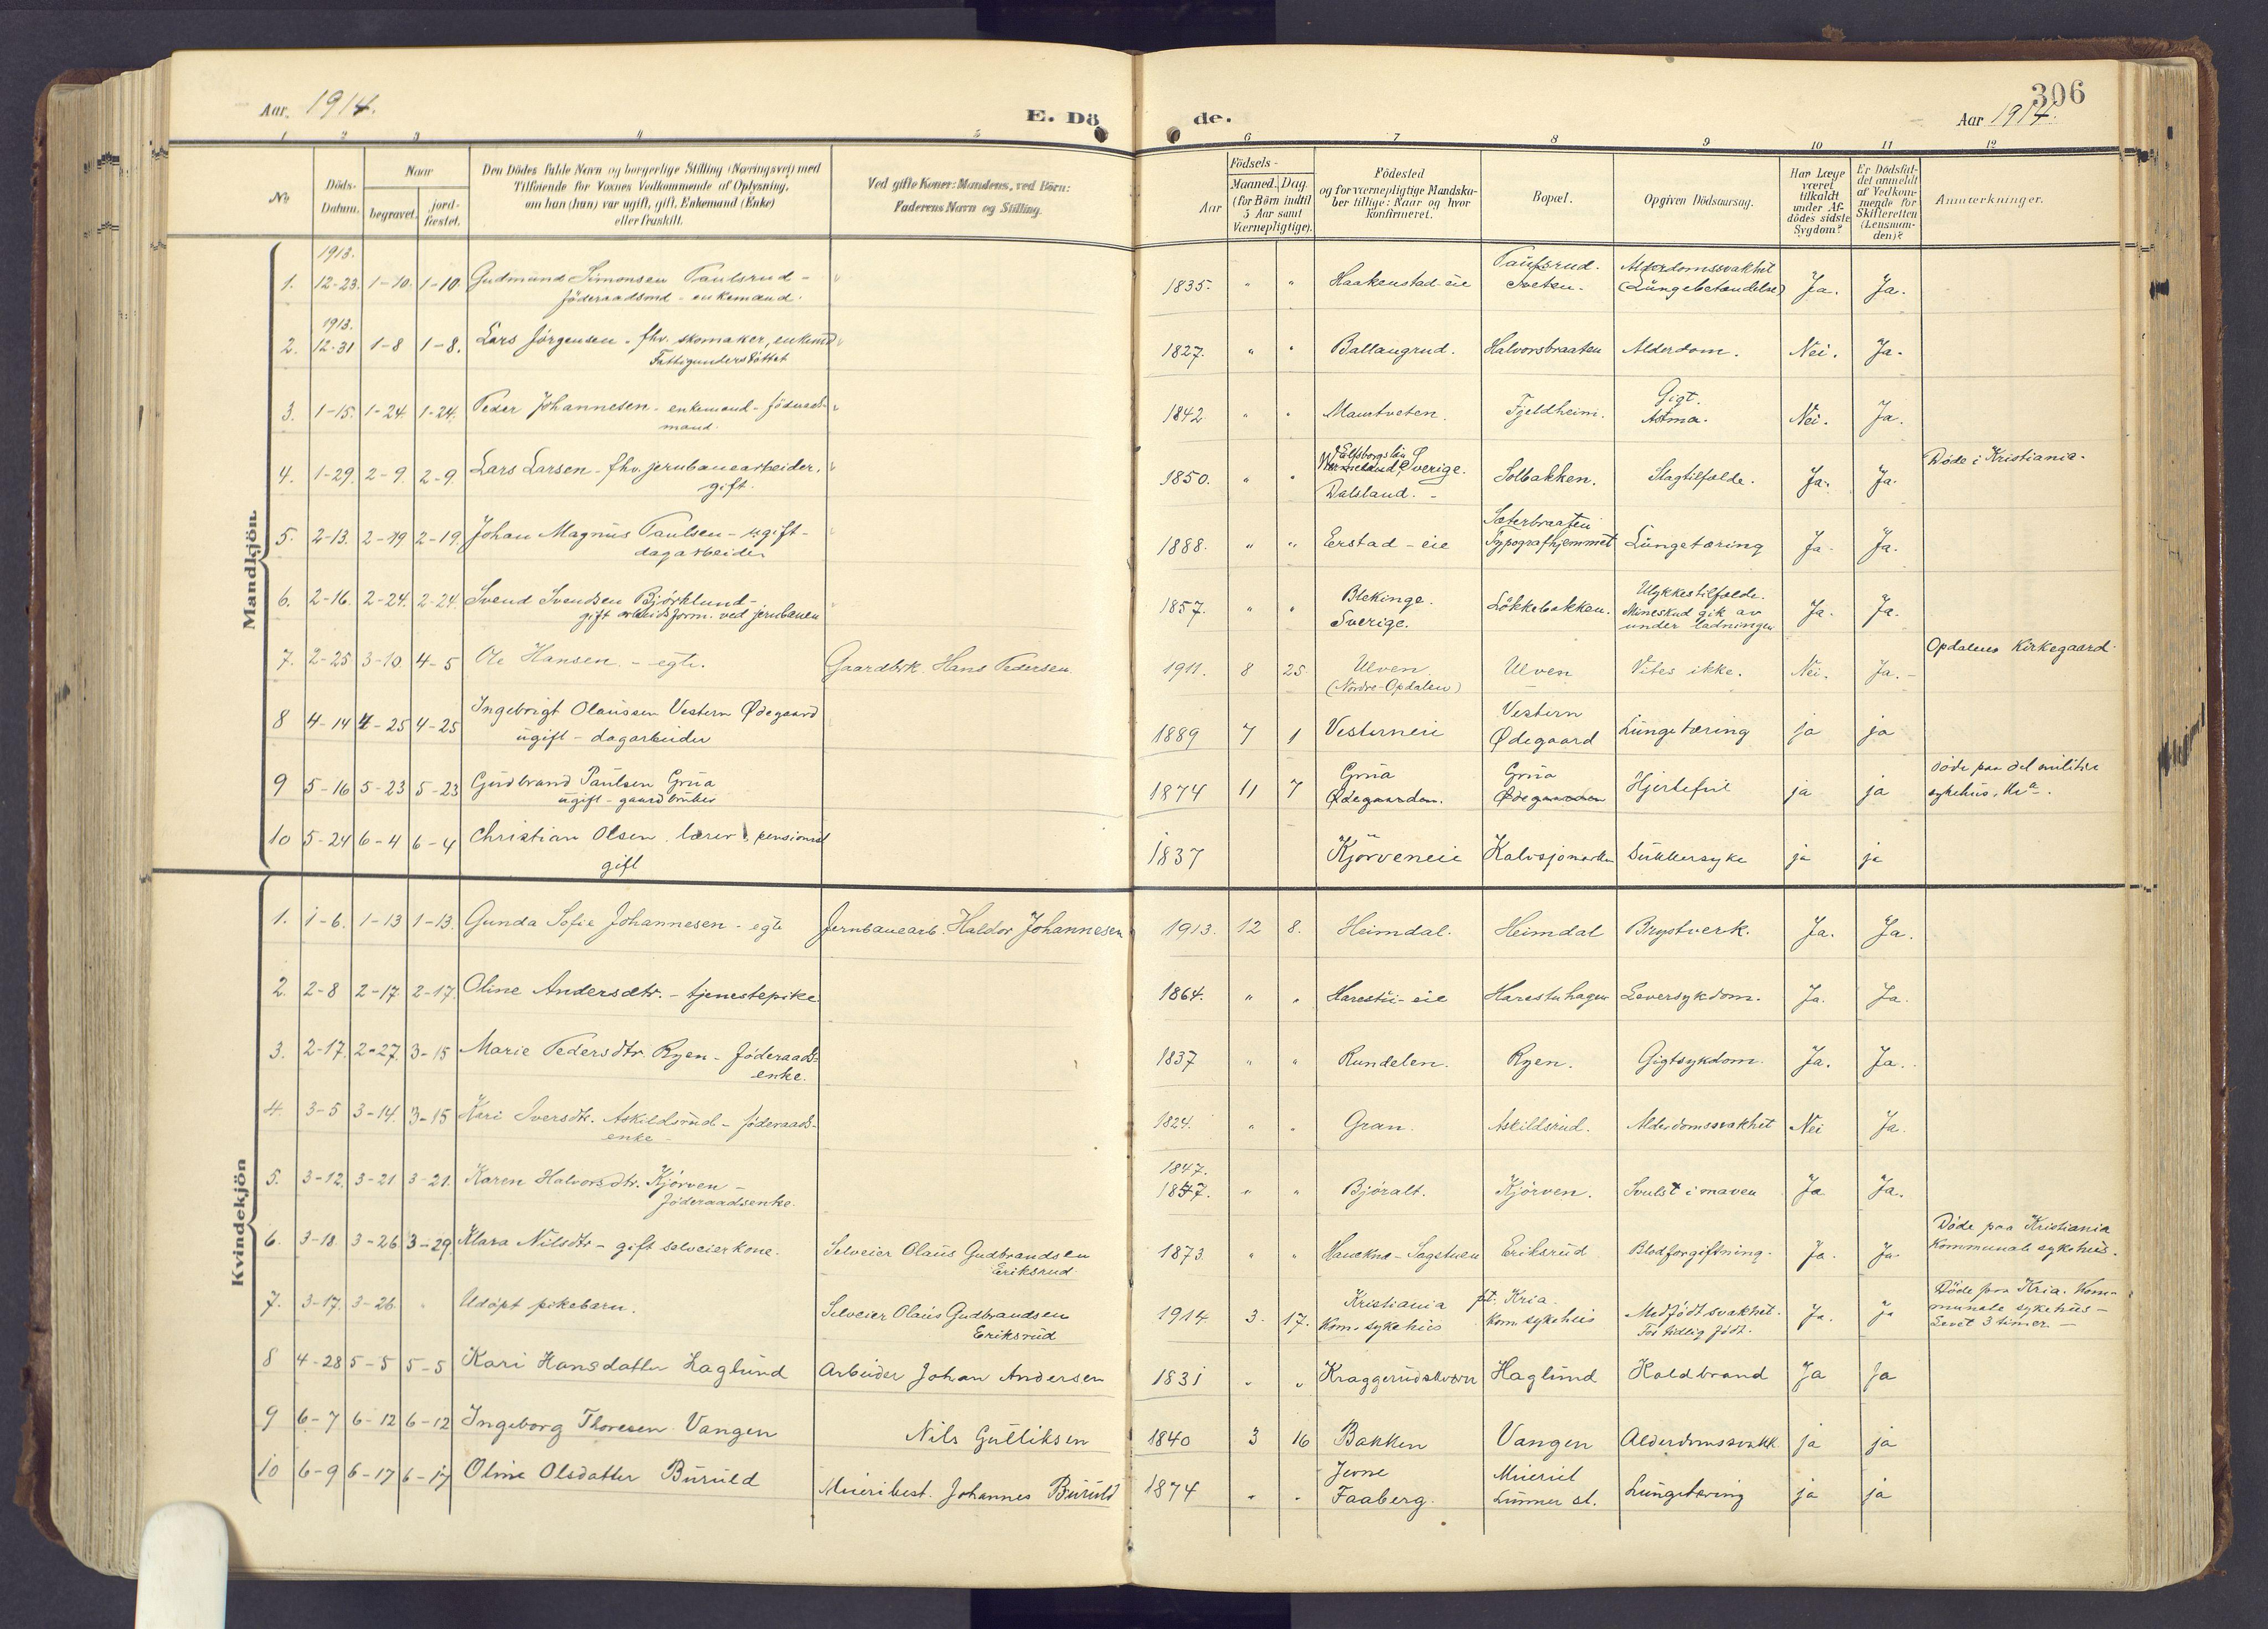 SAH, Lunner prestekontor, H/Ha/Haa/L0001: Ministerialbok nr. 1, 1907-1922, s. 306